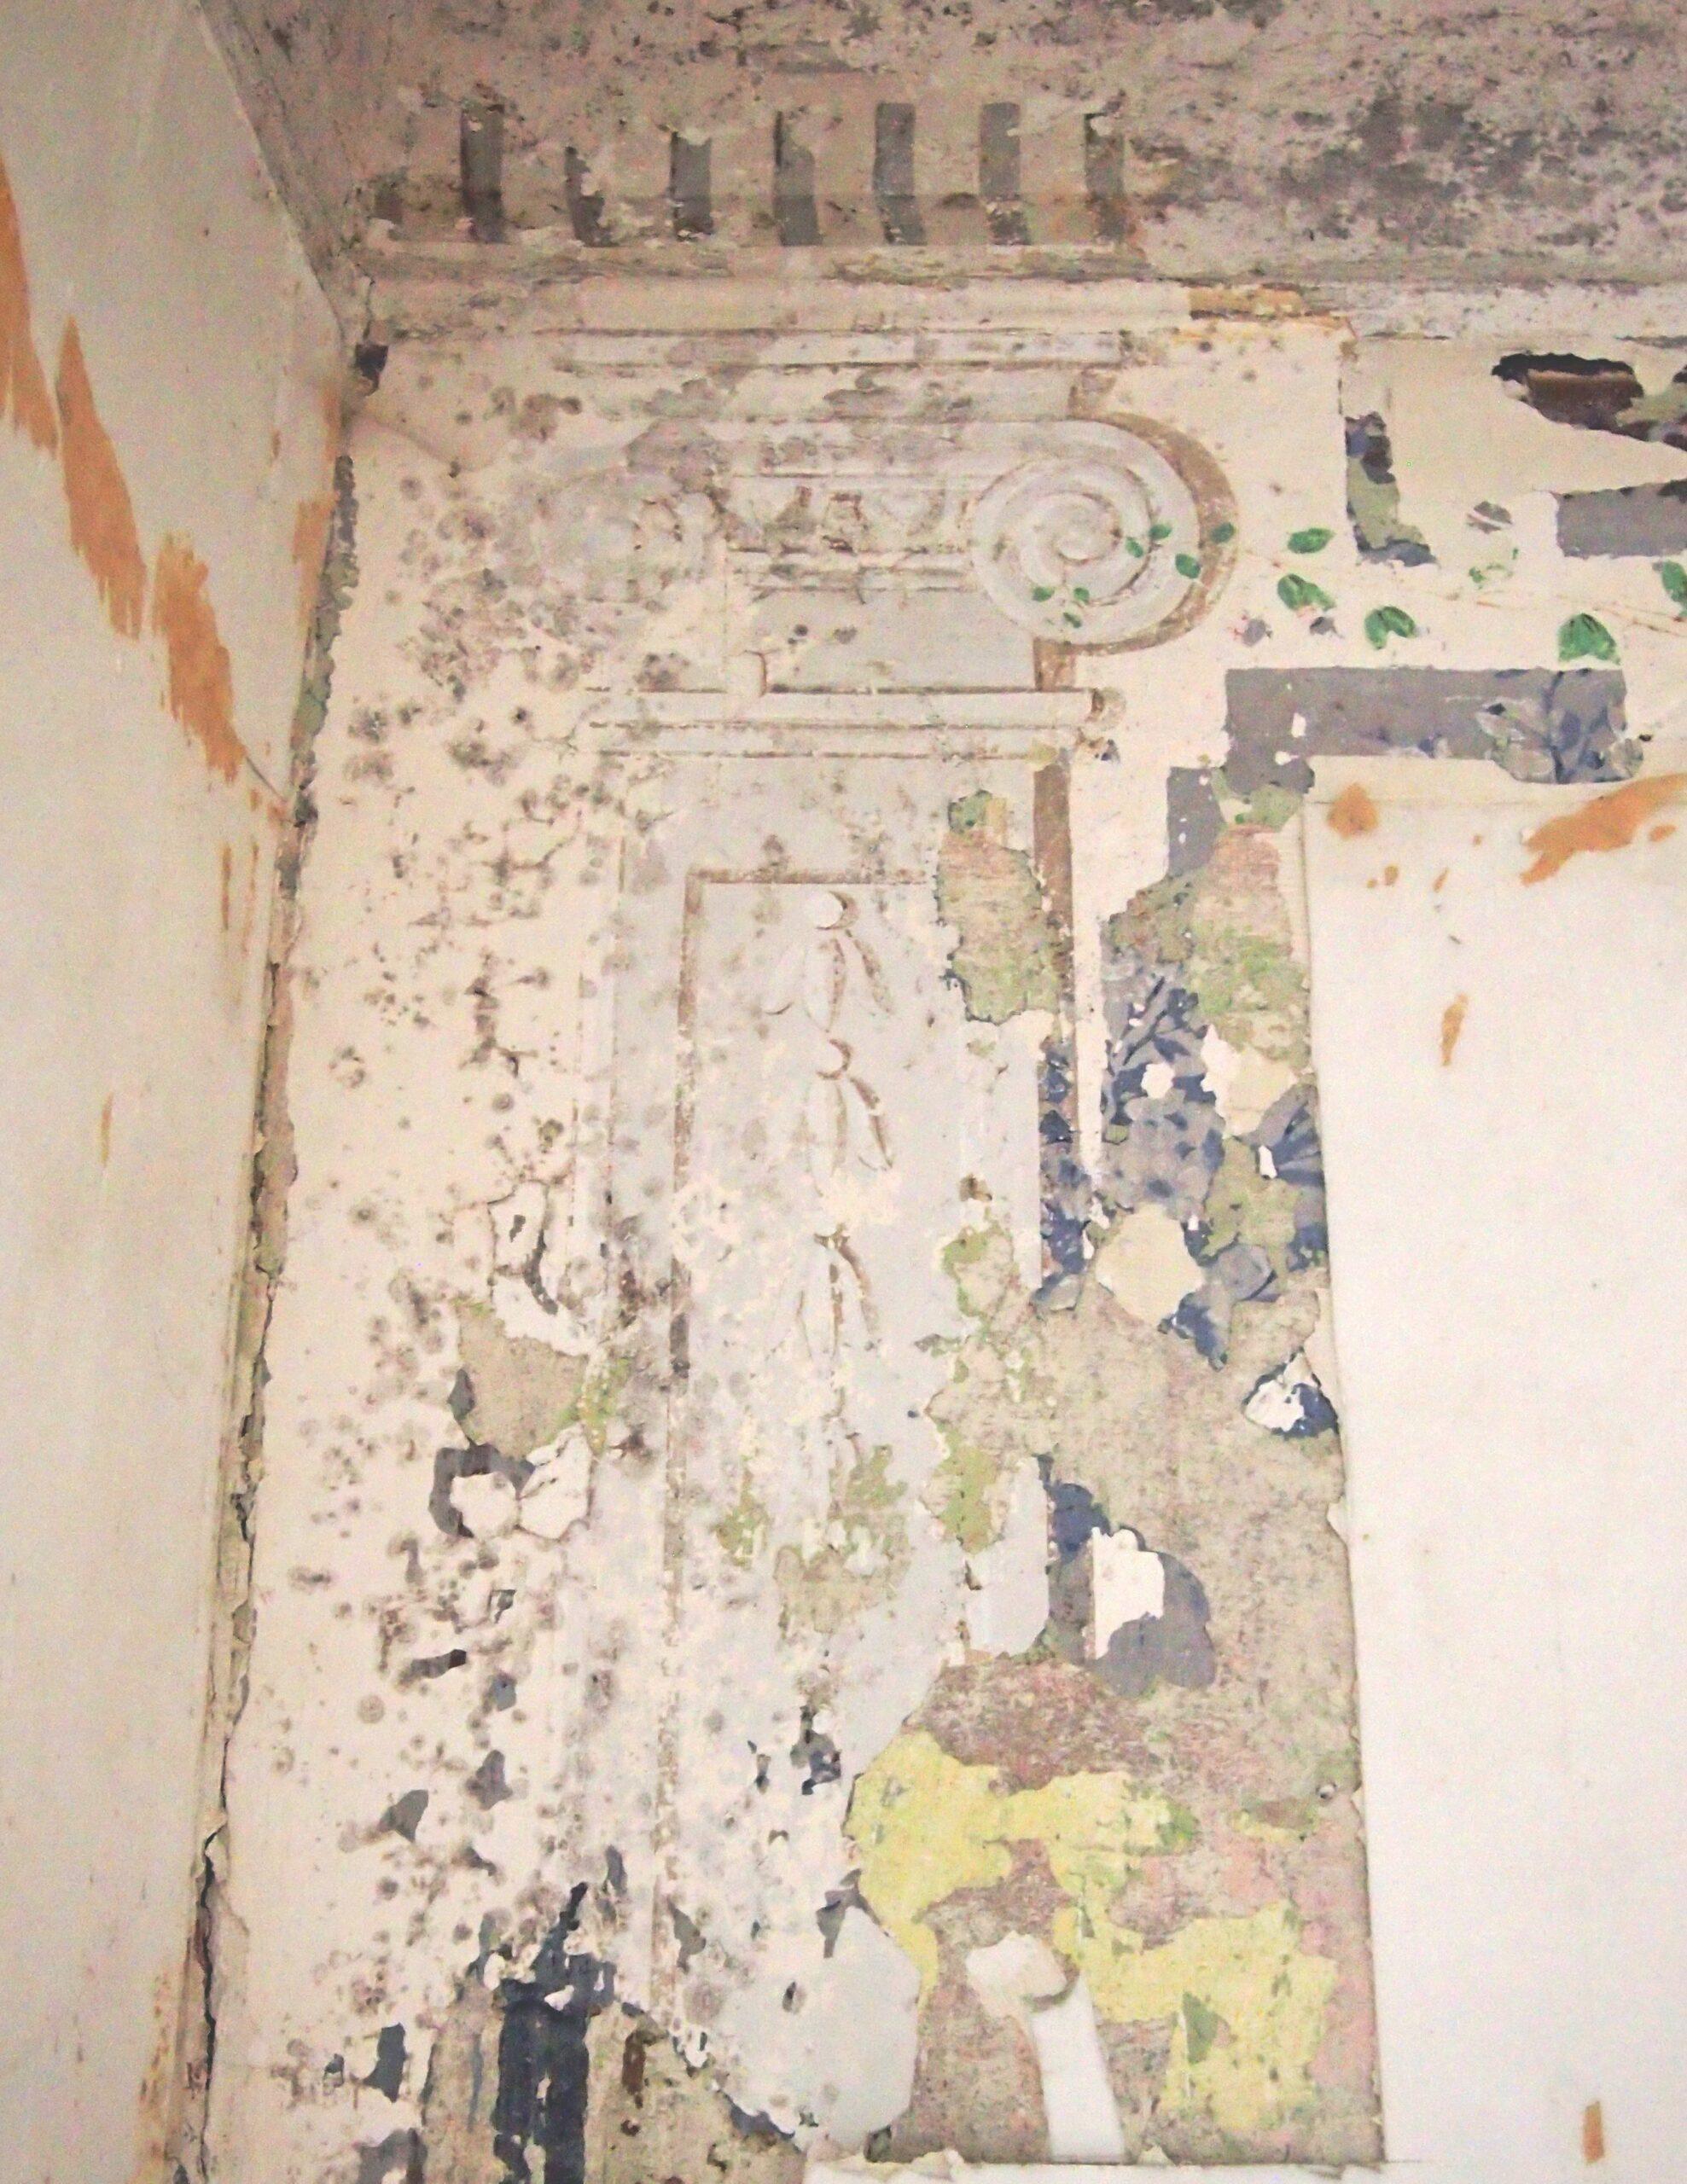 Ehemaliger Salon, Pilastermotiv mit Kapitell,, Ende 18. Jh. t